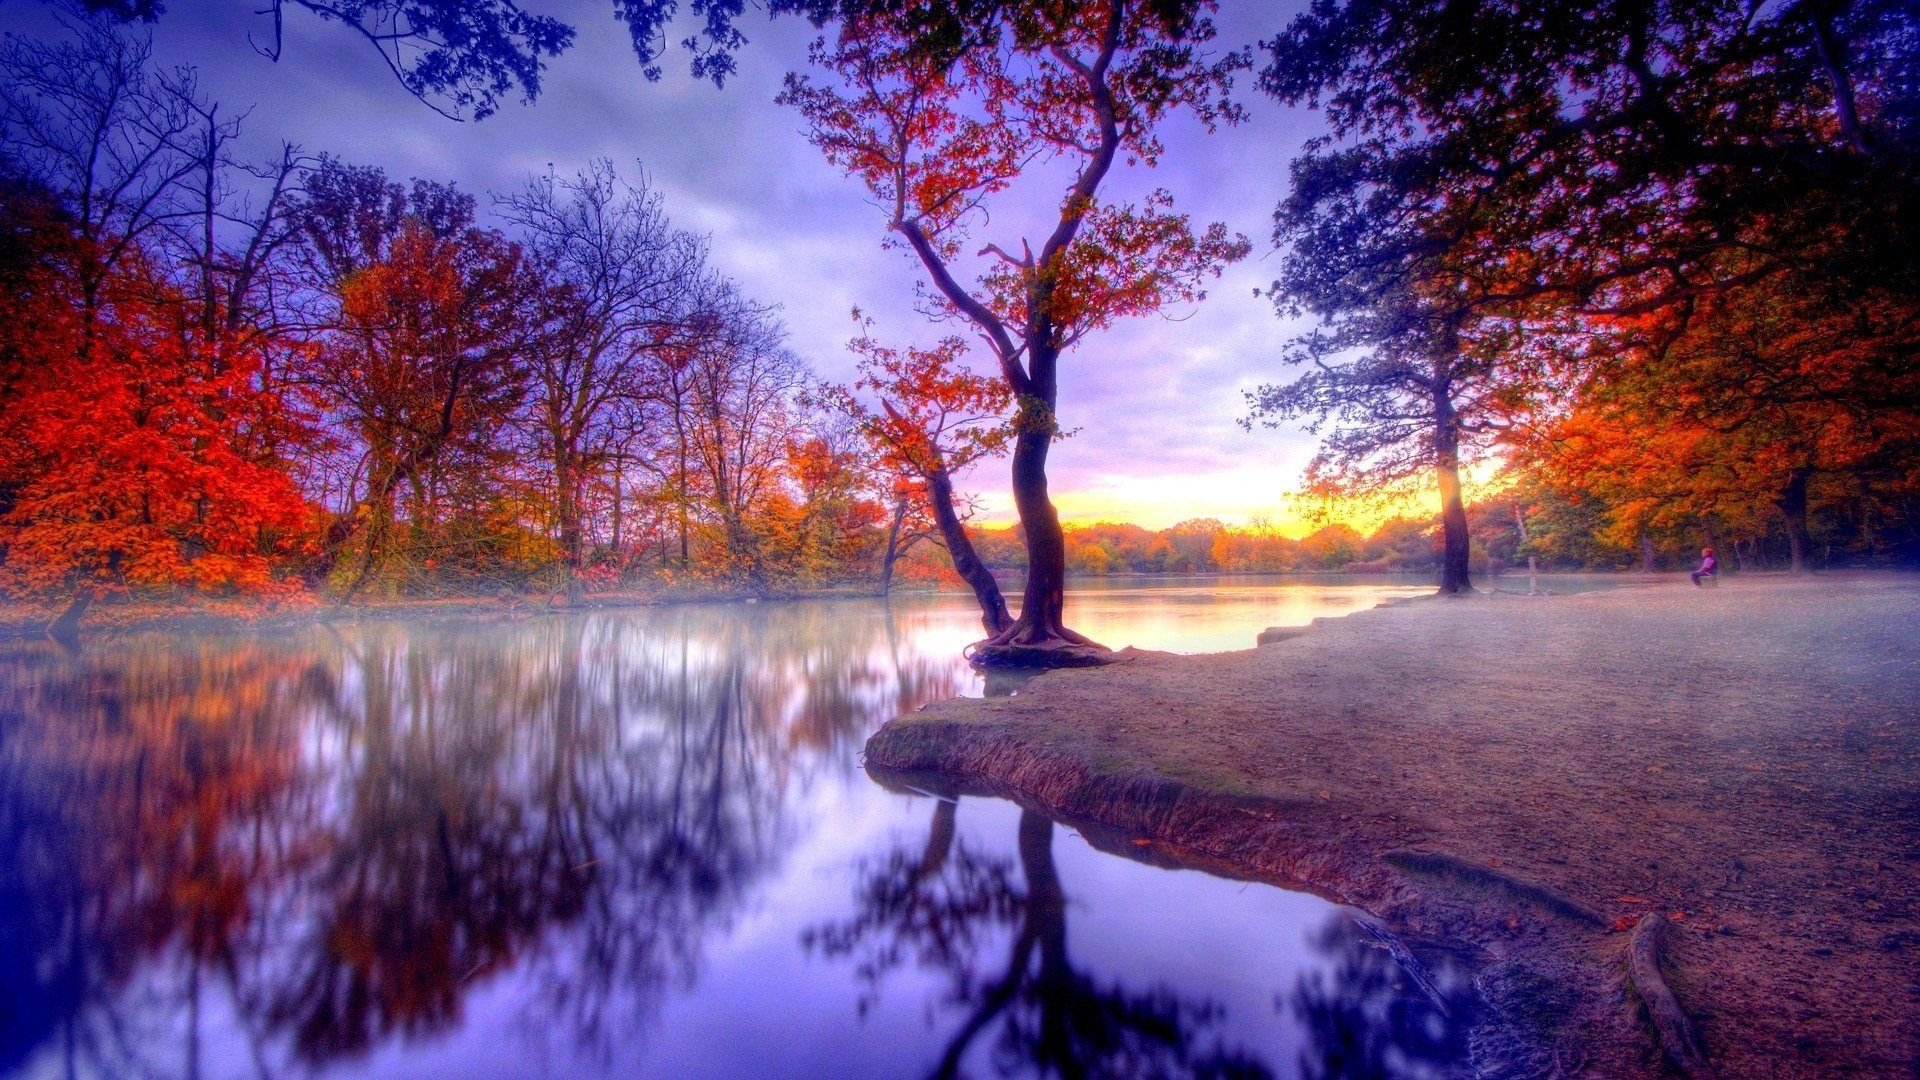 Fall Landscapes Autumn Landscape Full Hd Desktop Wallpapers 1080p Landscape Wallpaper